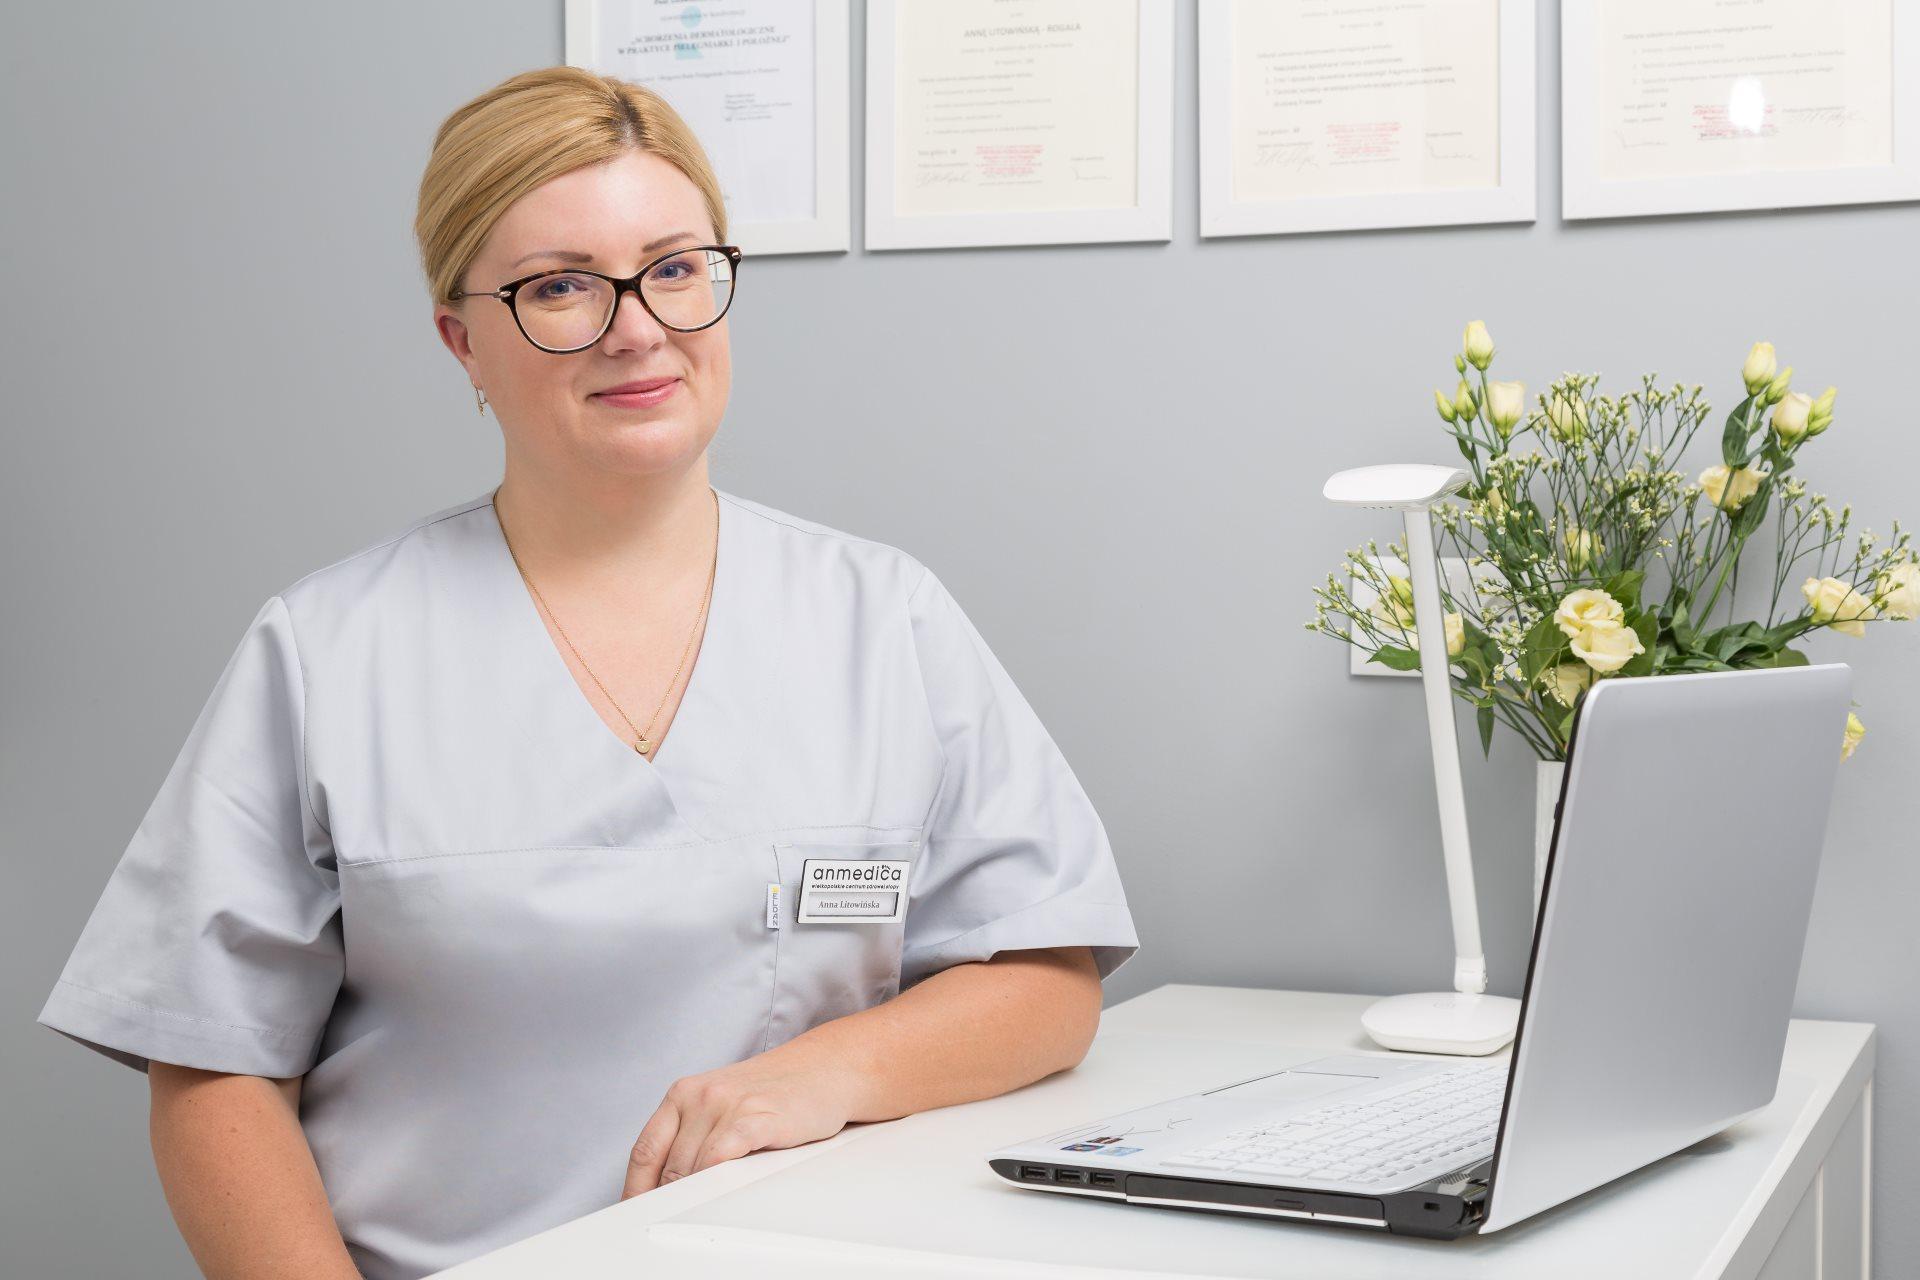 Podolog Anna Litowińska pracująca w Anmedica Poznań